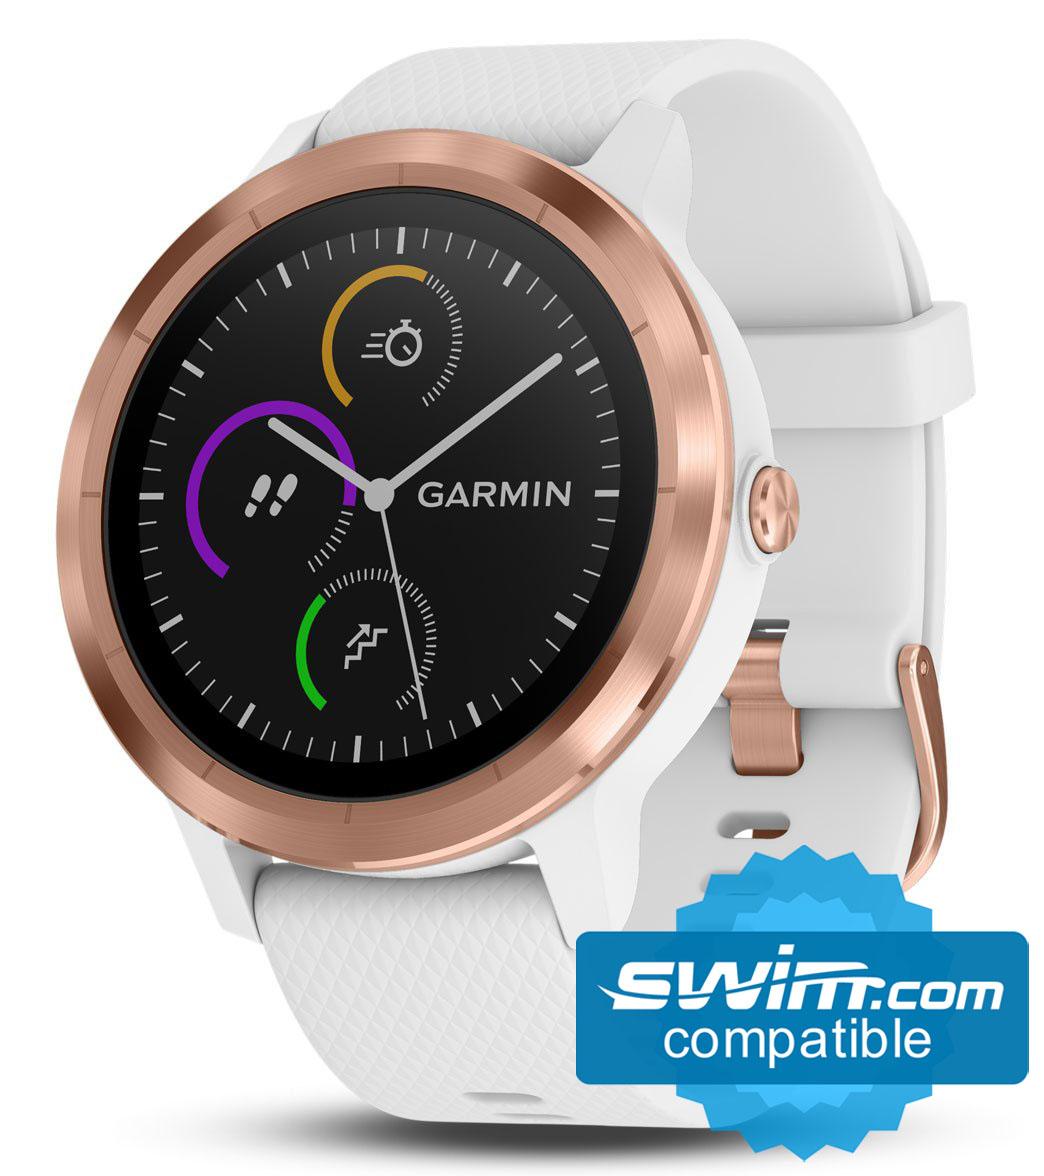 68715f9bcaa3 Garmin Vivoactive 3 GPS Smartwatch at SwimOutlet.com - Free Shipping